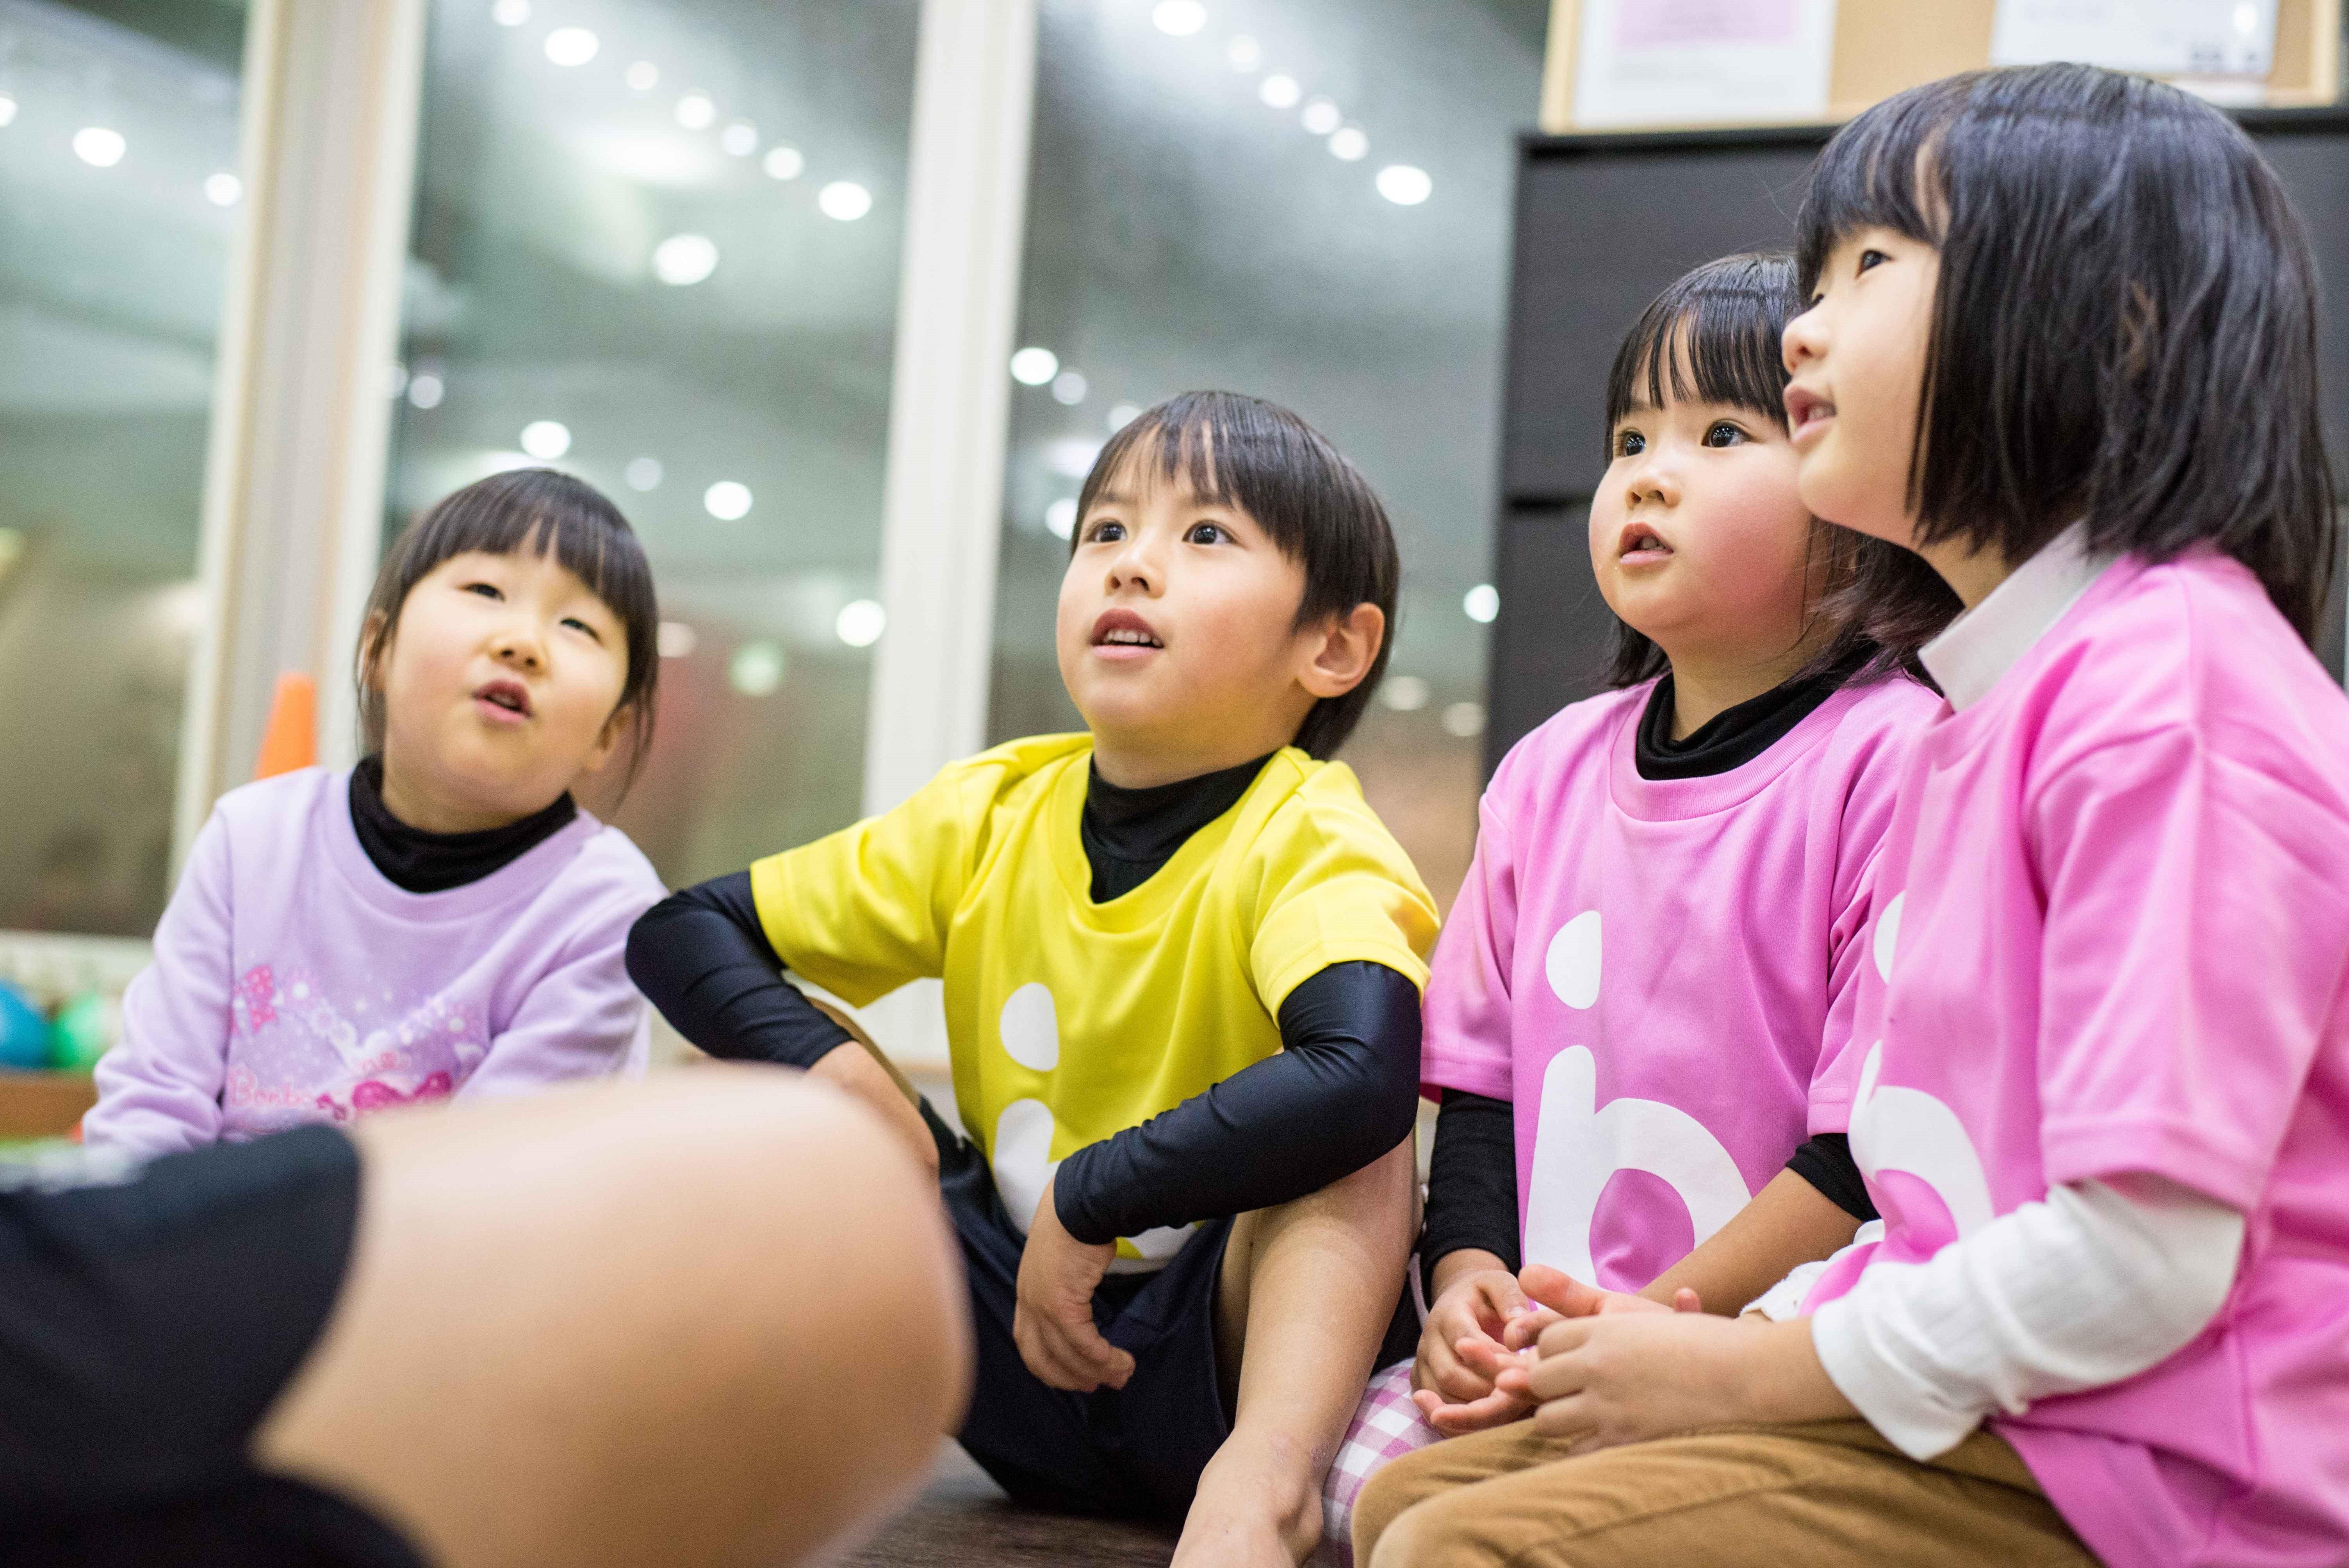 biima sports 安曇野校